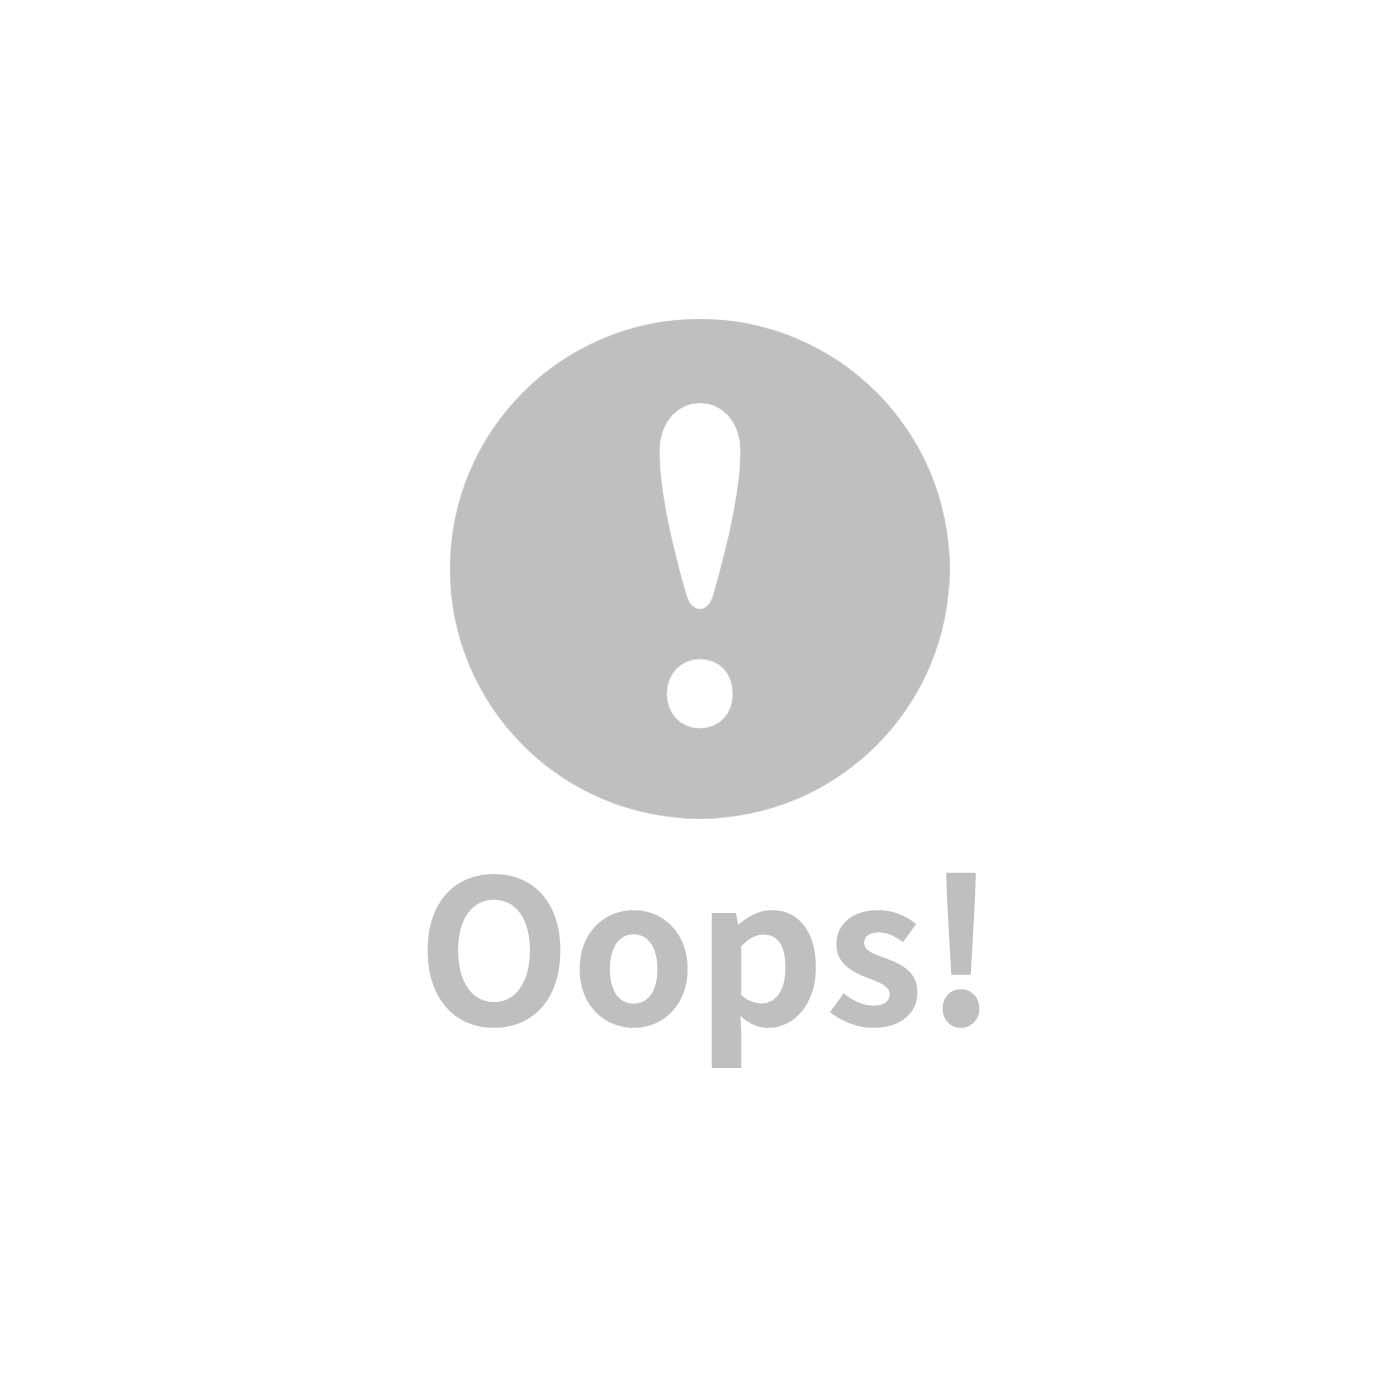 Pacific Baby 美國不鏽鋼保溫太空瓶7oz+4oz二入學習喝水組(勇氣藍7oz+健康綠4oz+綠學習配件)